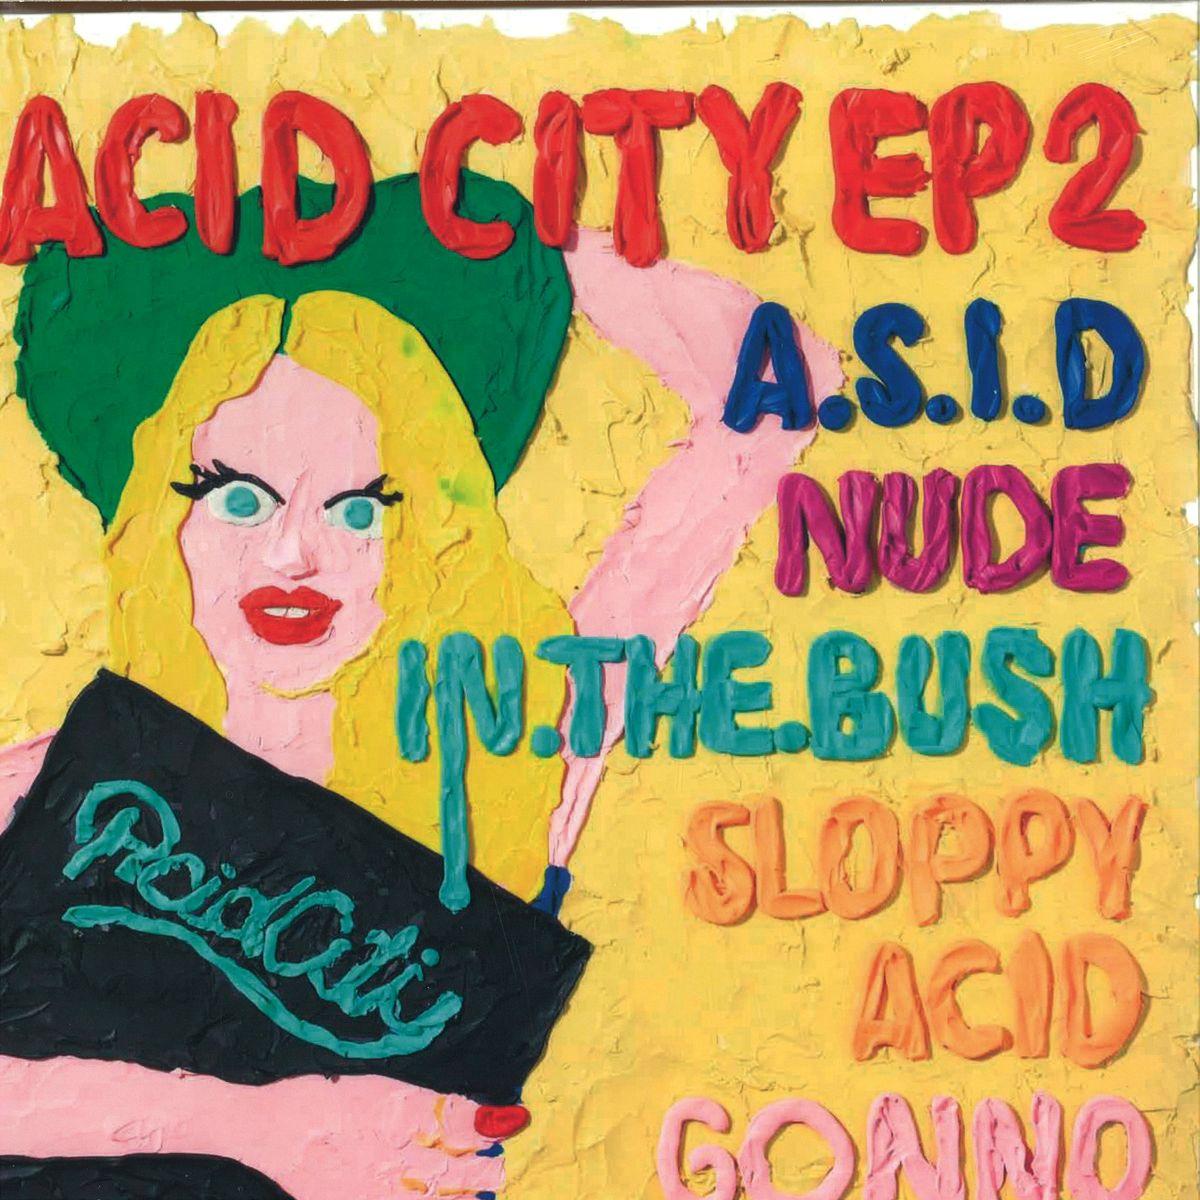 Various Artists Acid City Ep 2 Uk England Nm21034 Vinyl